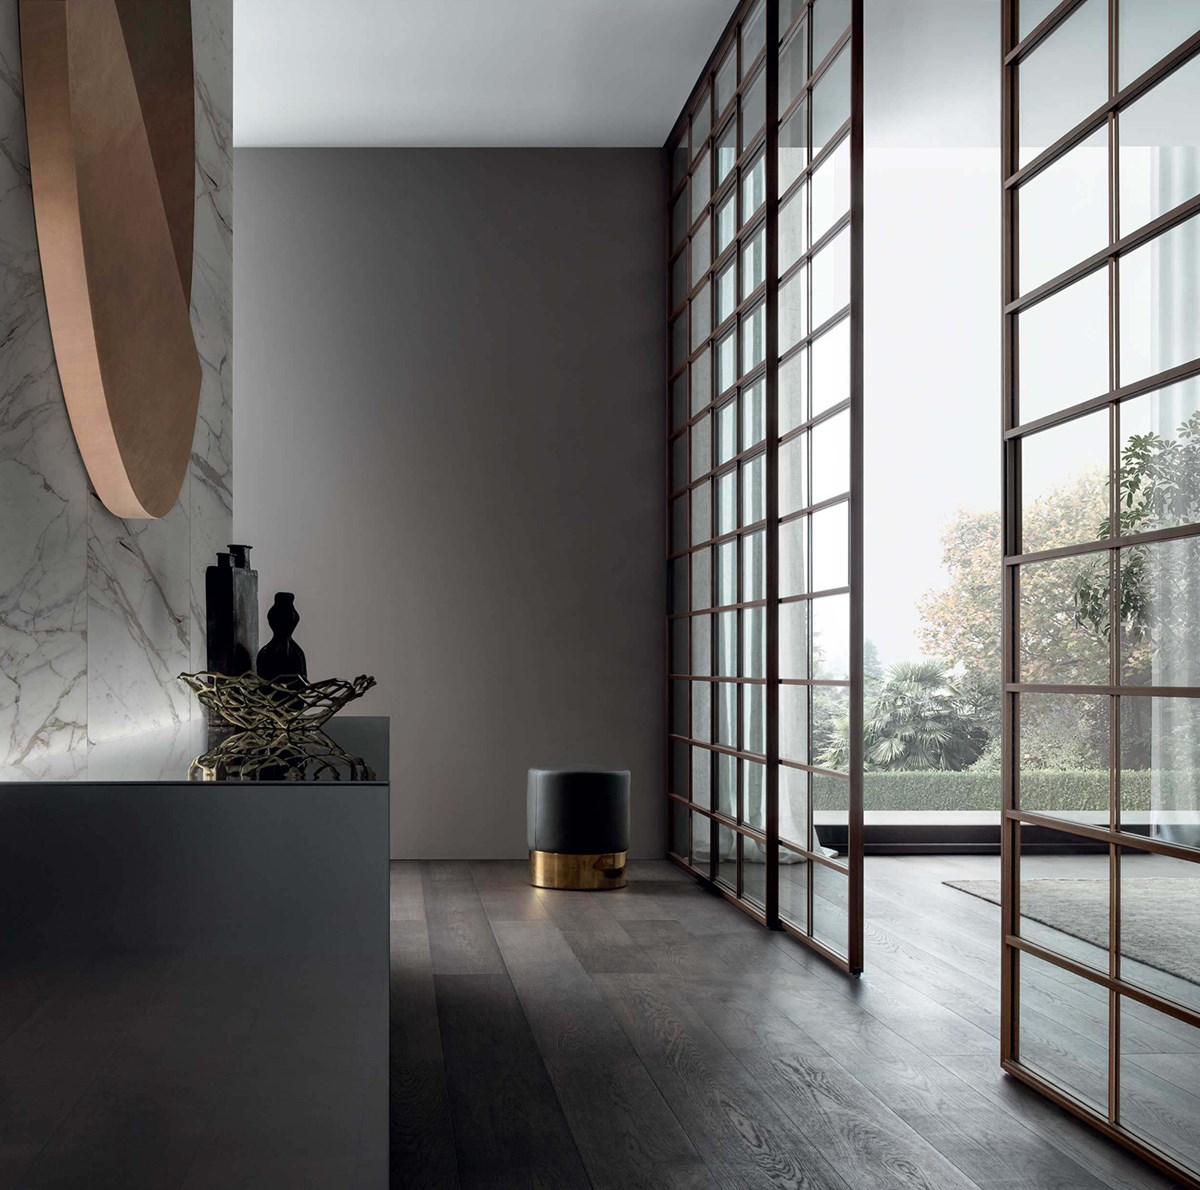 Rimadesio-Giuseppe-Bavuso-Soho-Sliding-Door-Matisse-1